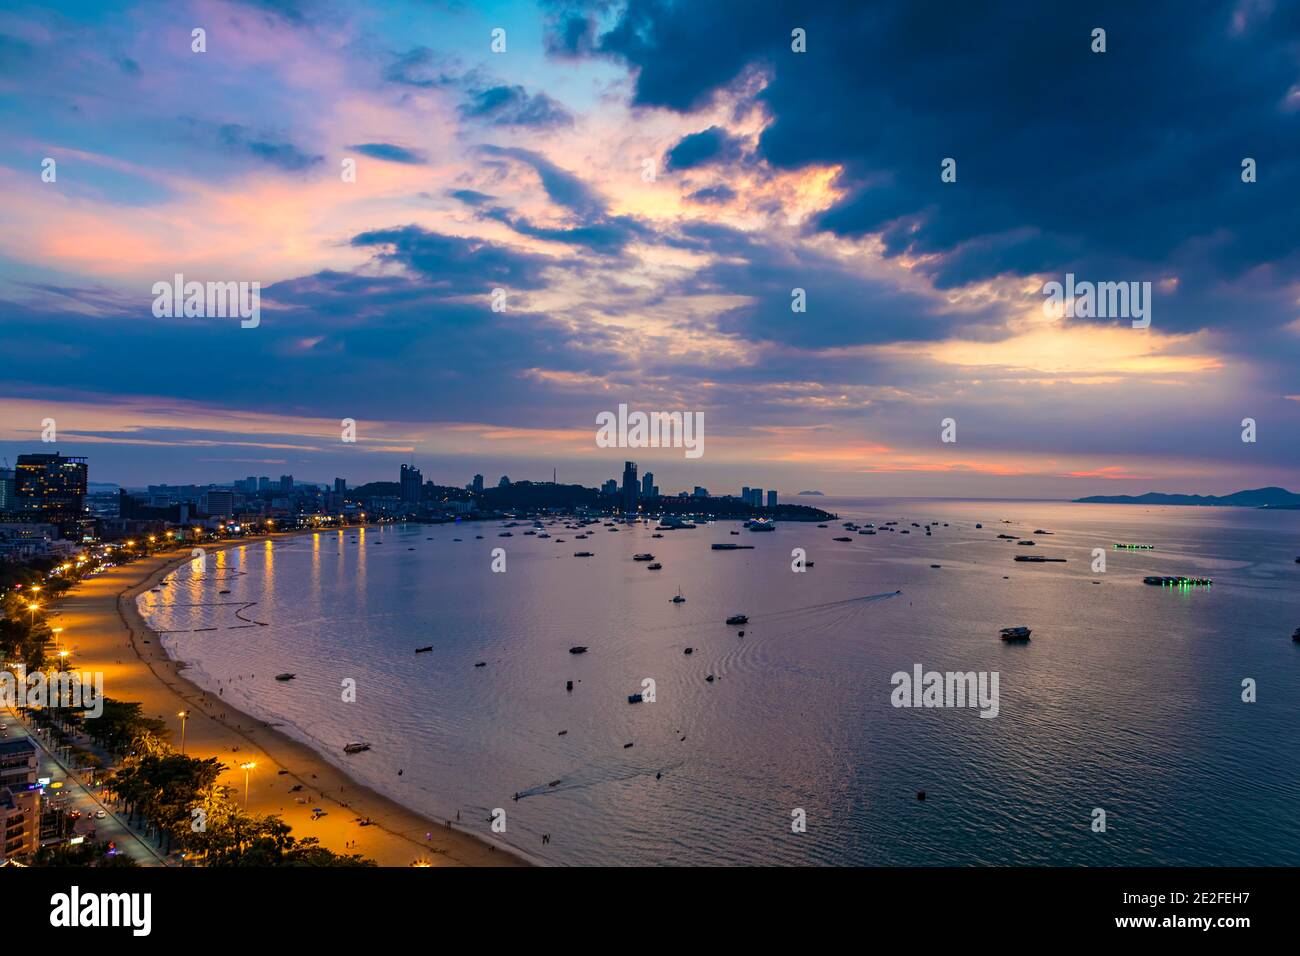 Evening landscape of Pattaya beach and sea, Chon Buri, ThailandPattaya, Chon Buri, Thailand Stock Photo